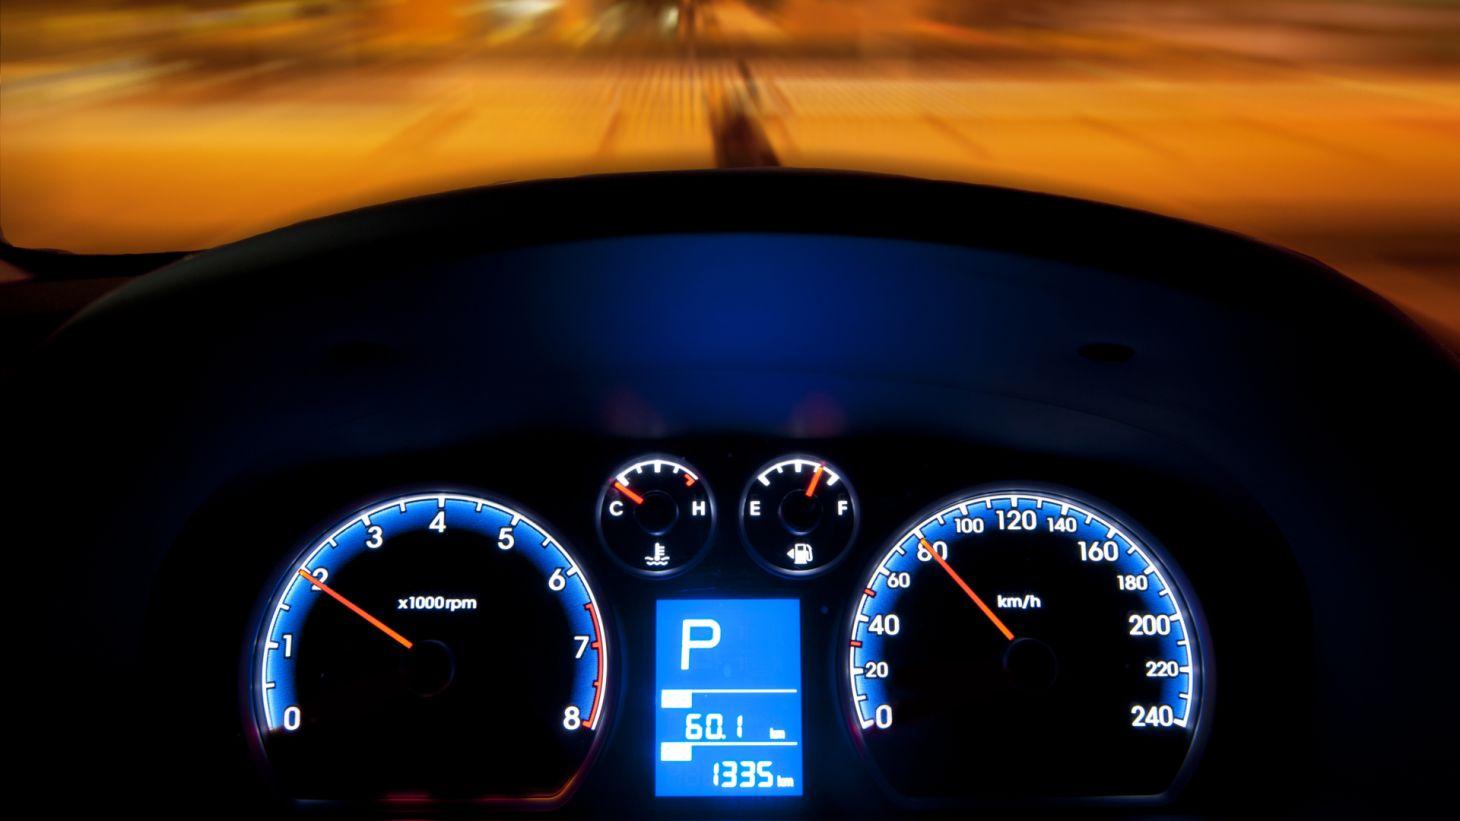 painel carro instrumentos conta giro velocidade